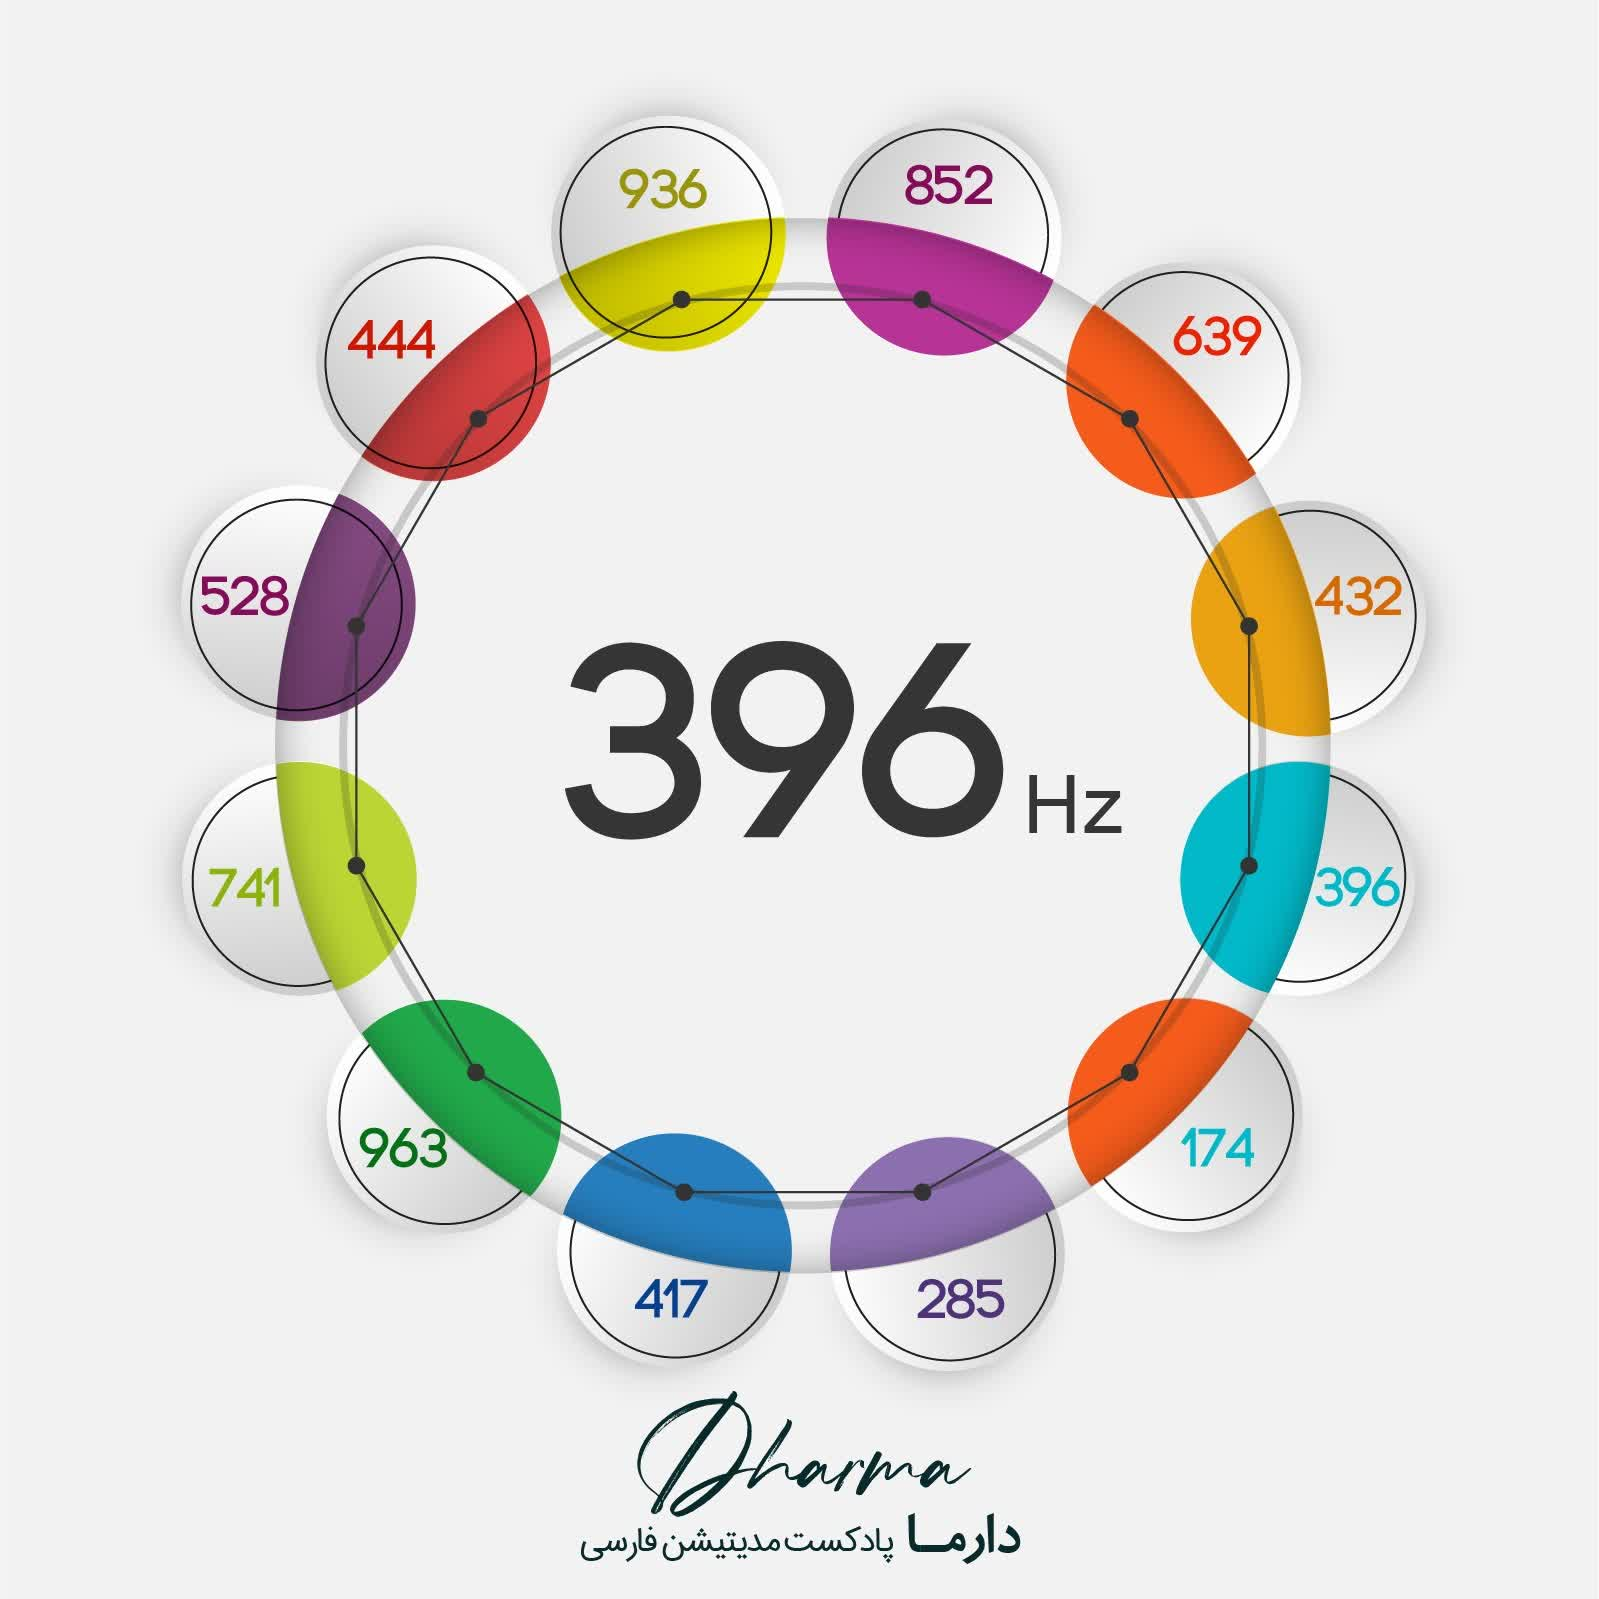 396Hz - فرکانس 396 هرتز